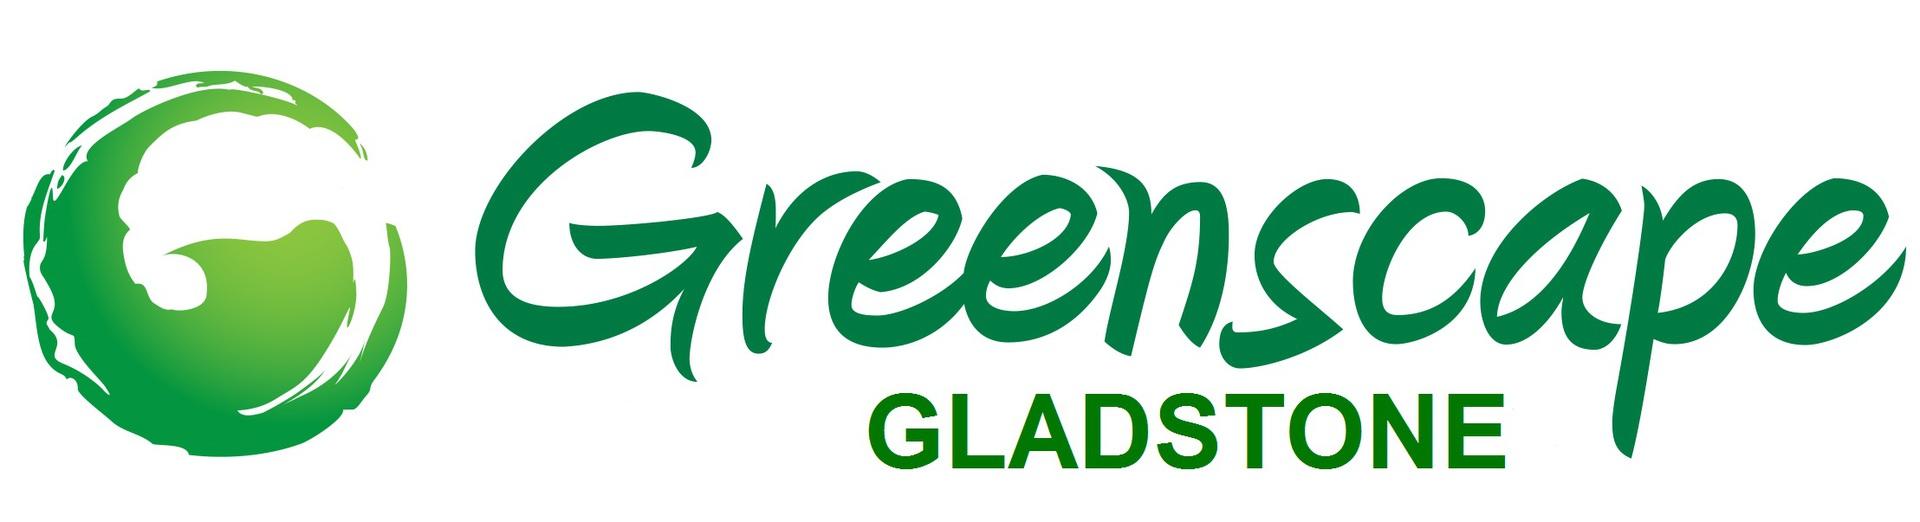 Greenscape Landscaping Irrigation & Design - Queensland, QLD 4680 - (07) 4978 1249 | ShowMeLocal.com